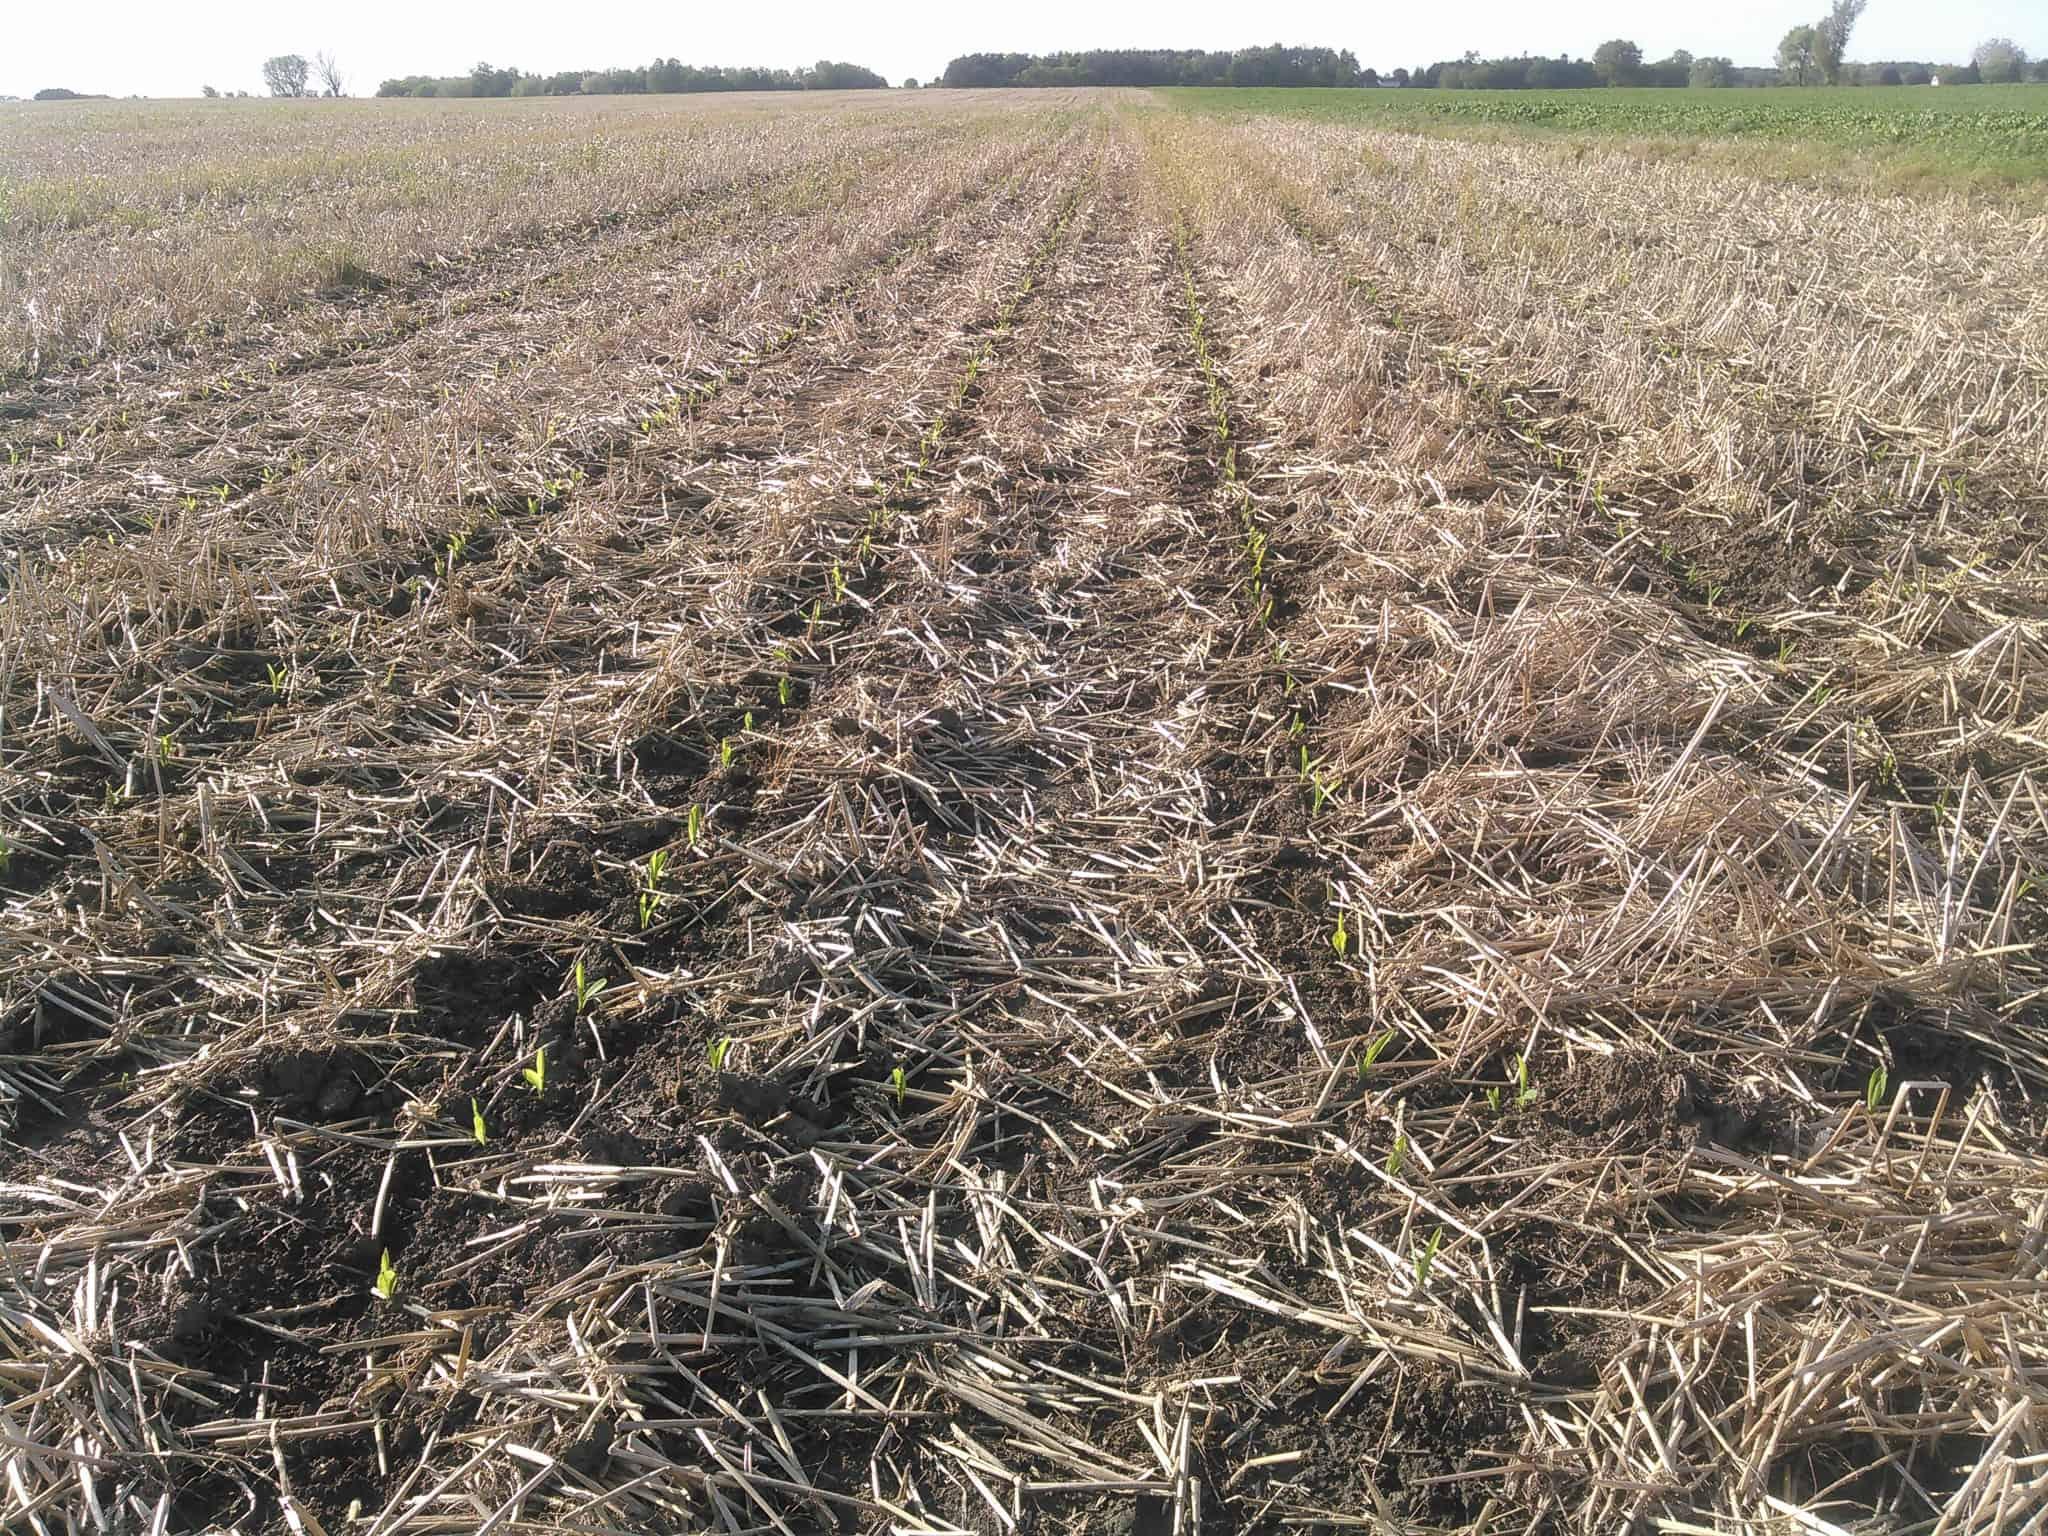 20190602-seedlings emerging from field – Soil story